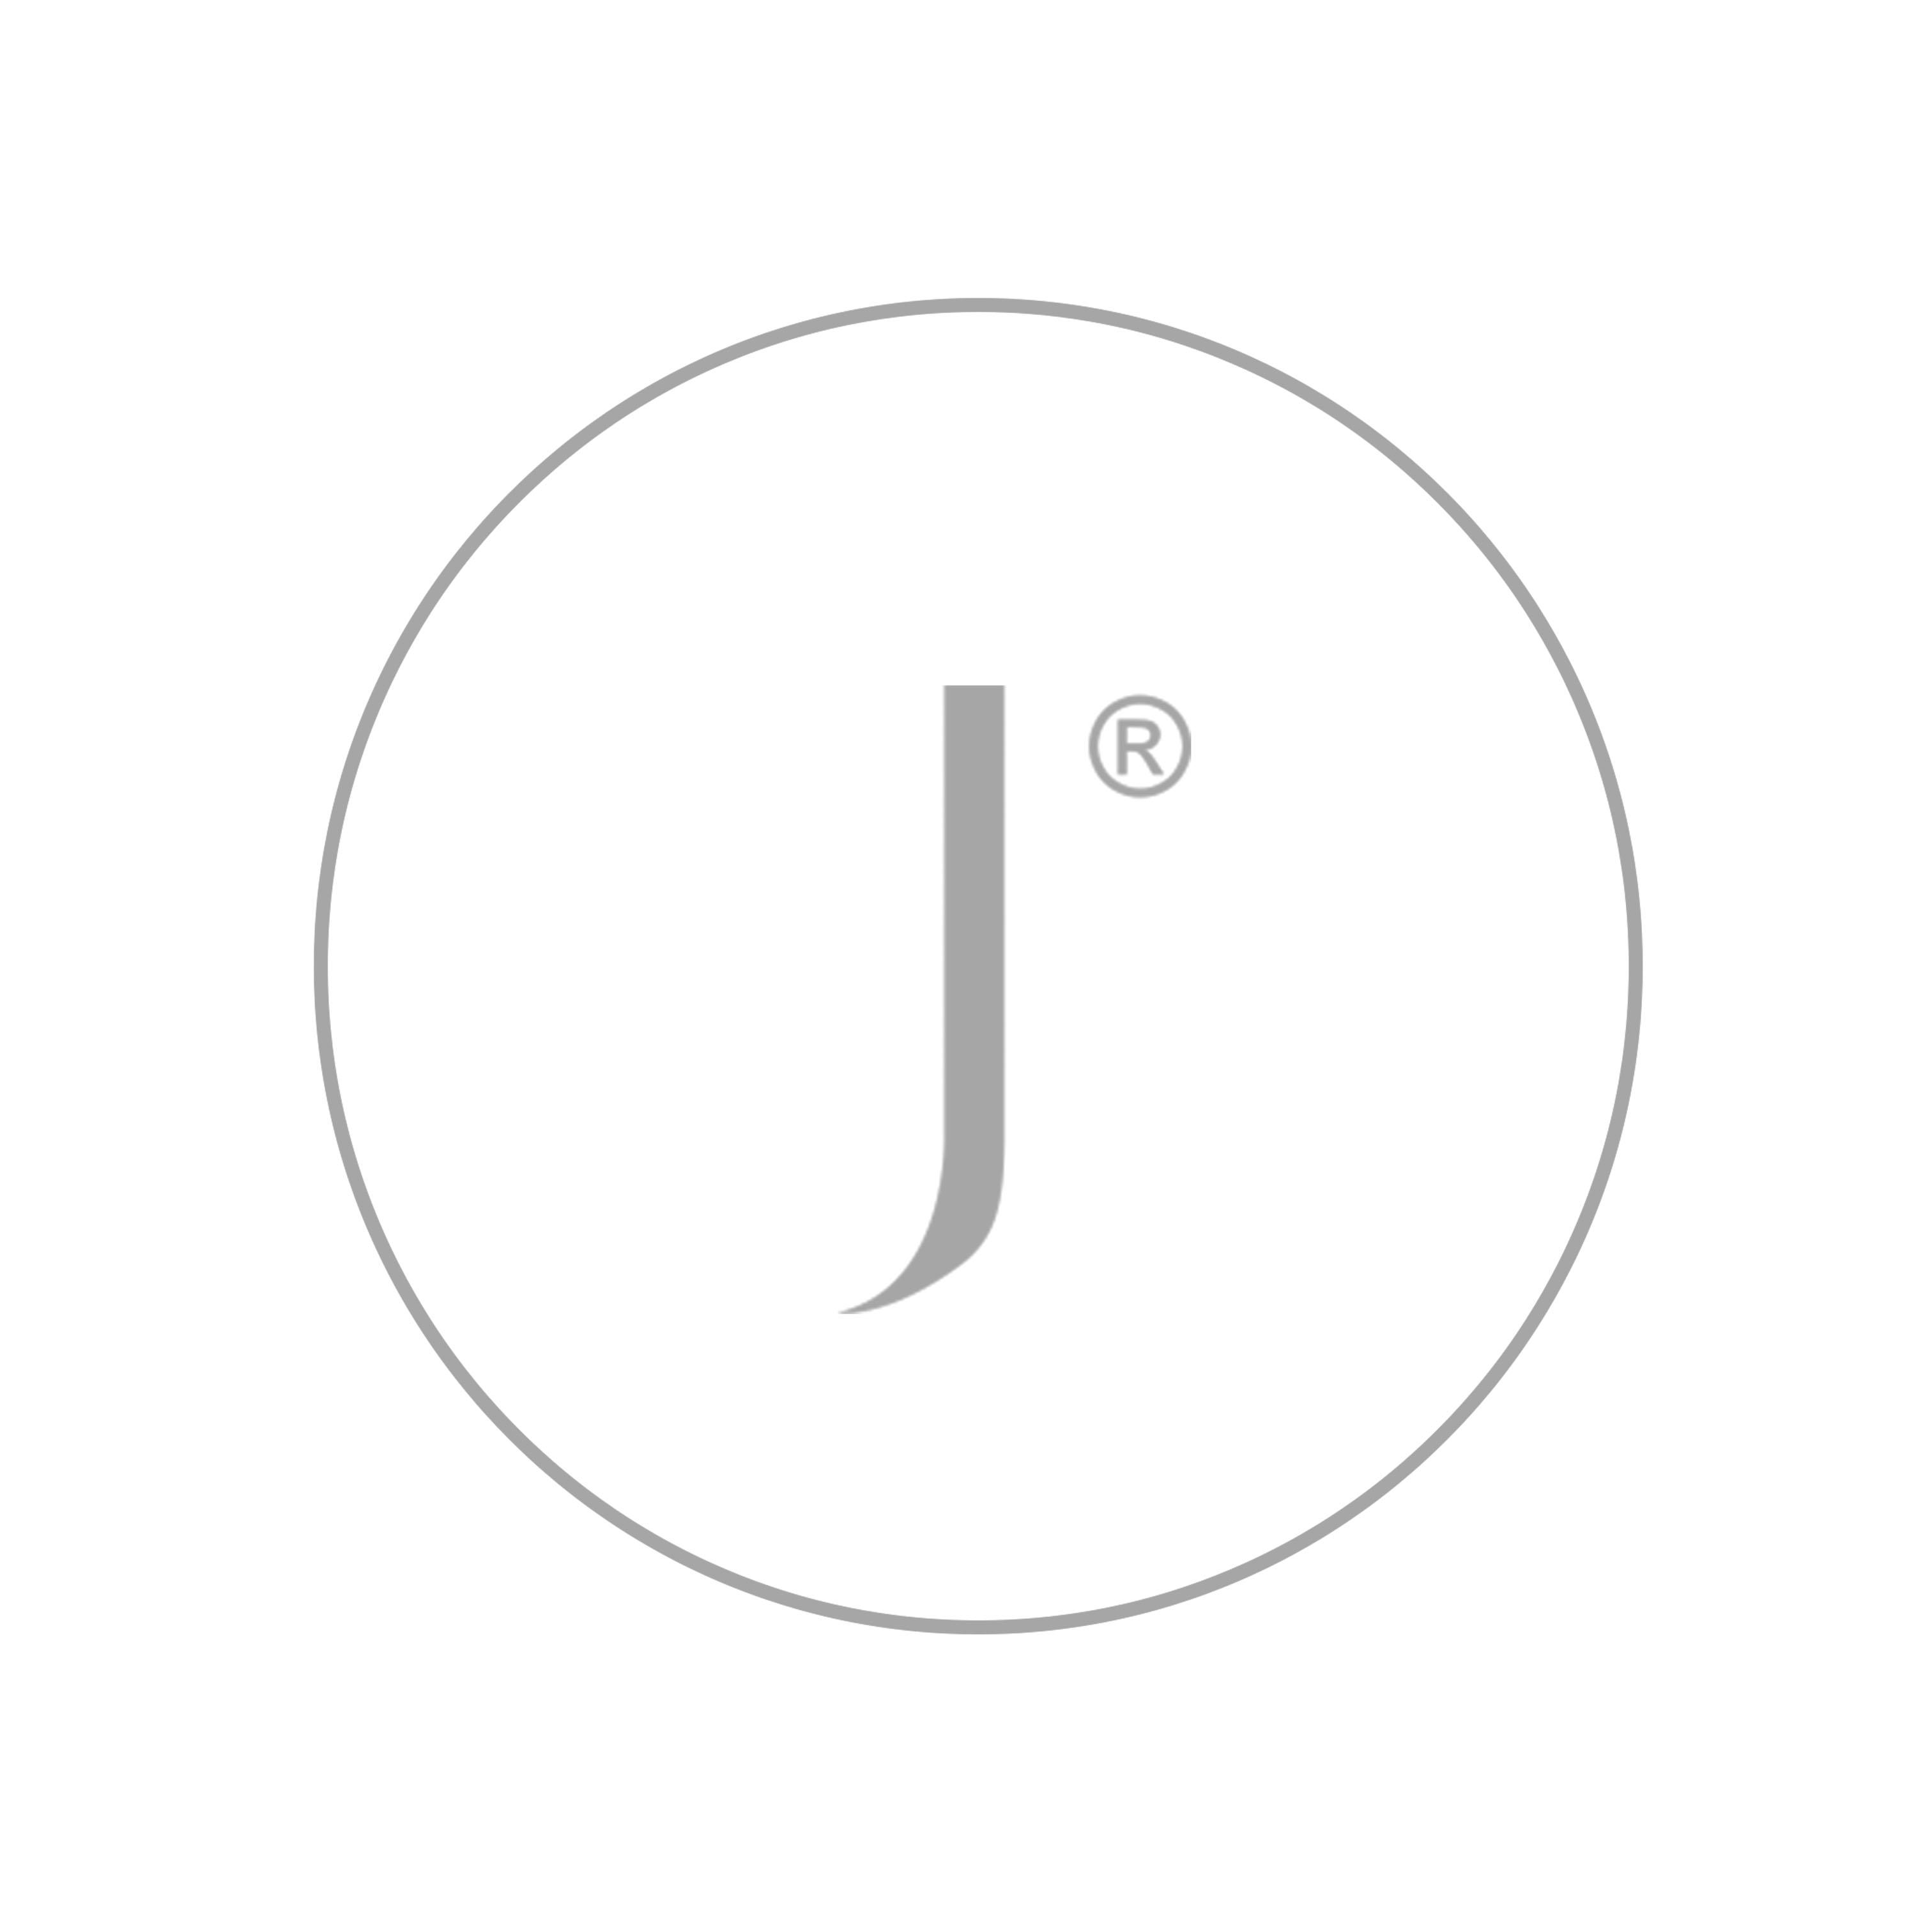 18kt Gold Drop Earrings In Aquamarine - March Birthstone